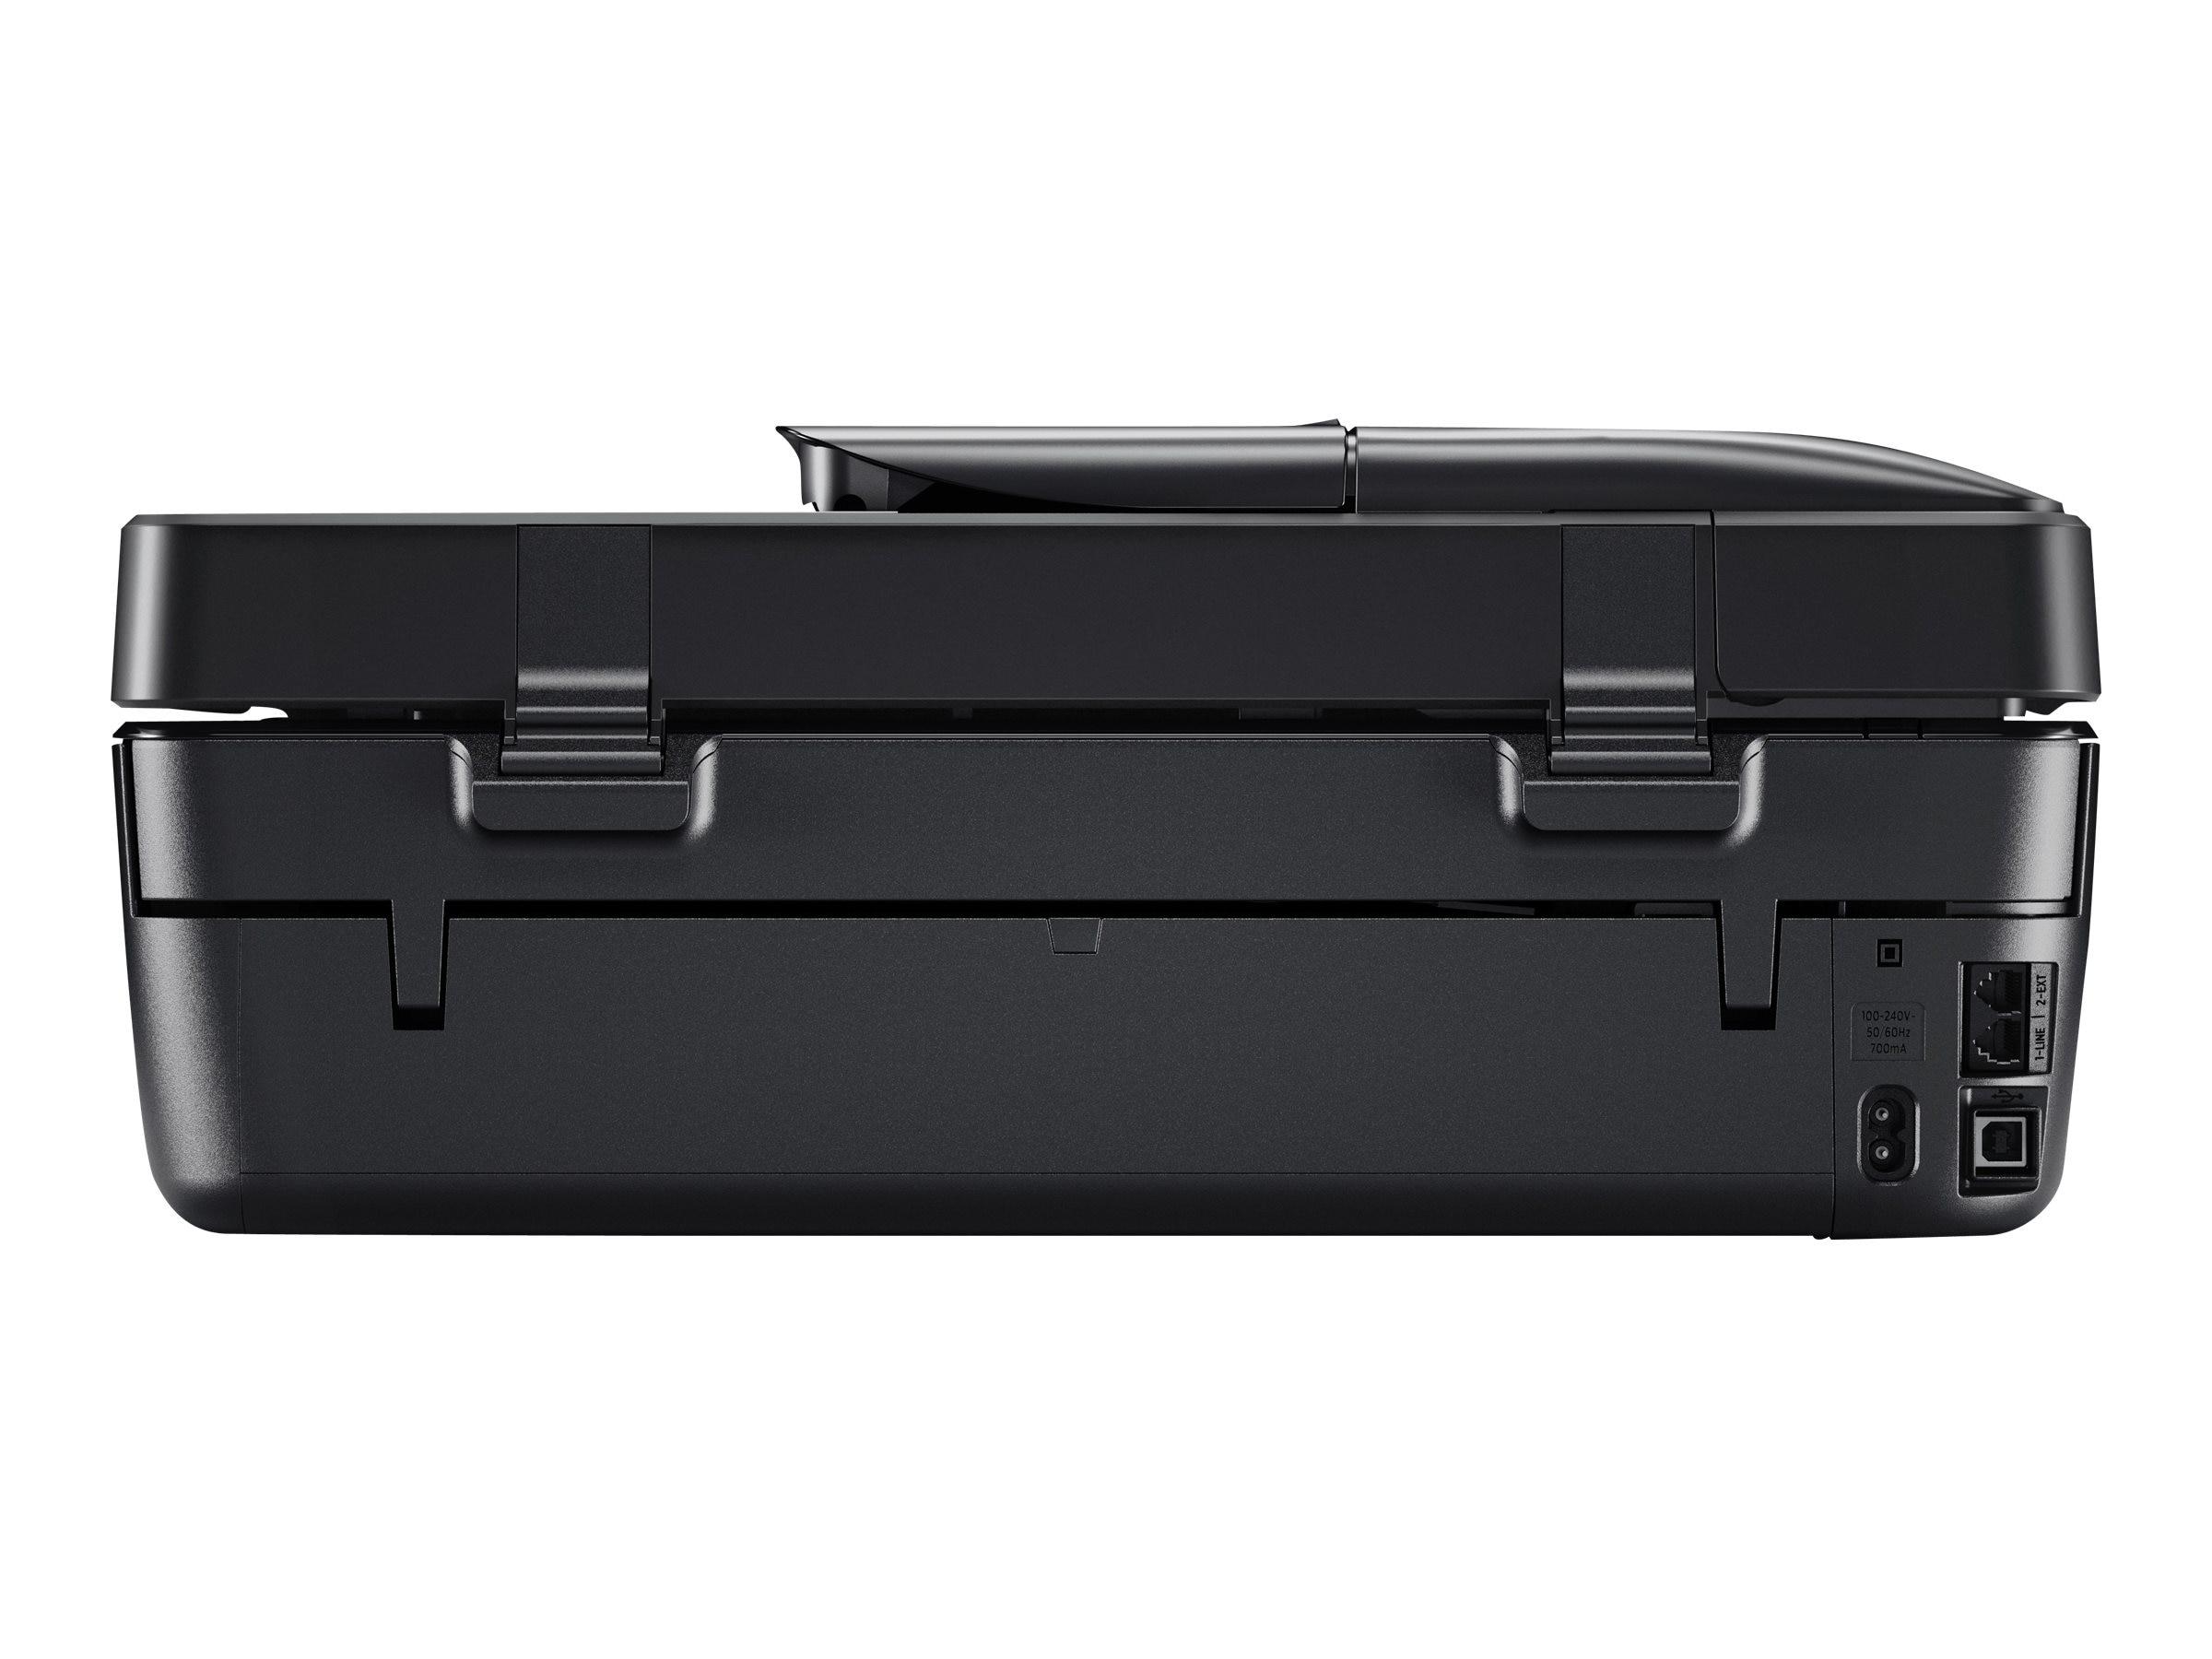 HP OfficeJet 5255 All-In-One Printer ( 129.99 -  60.00 Instant (M2U75A B1H) 7a73ffc28